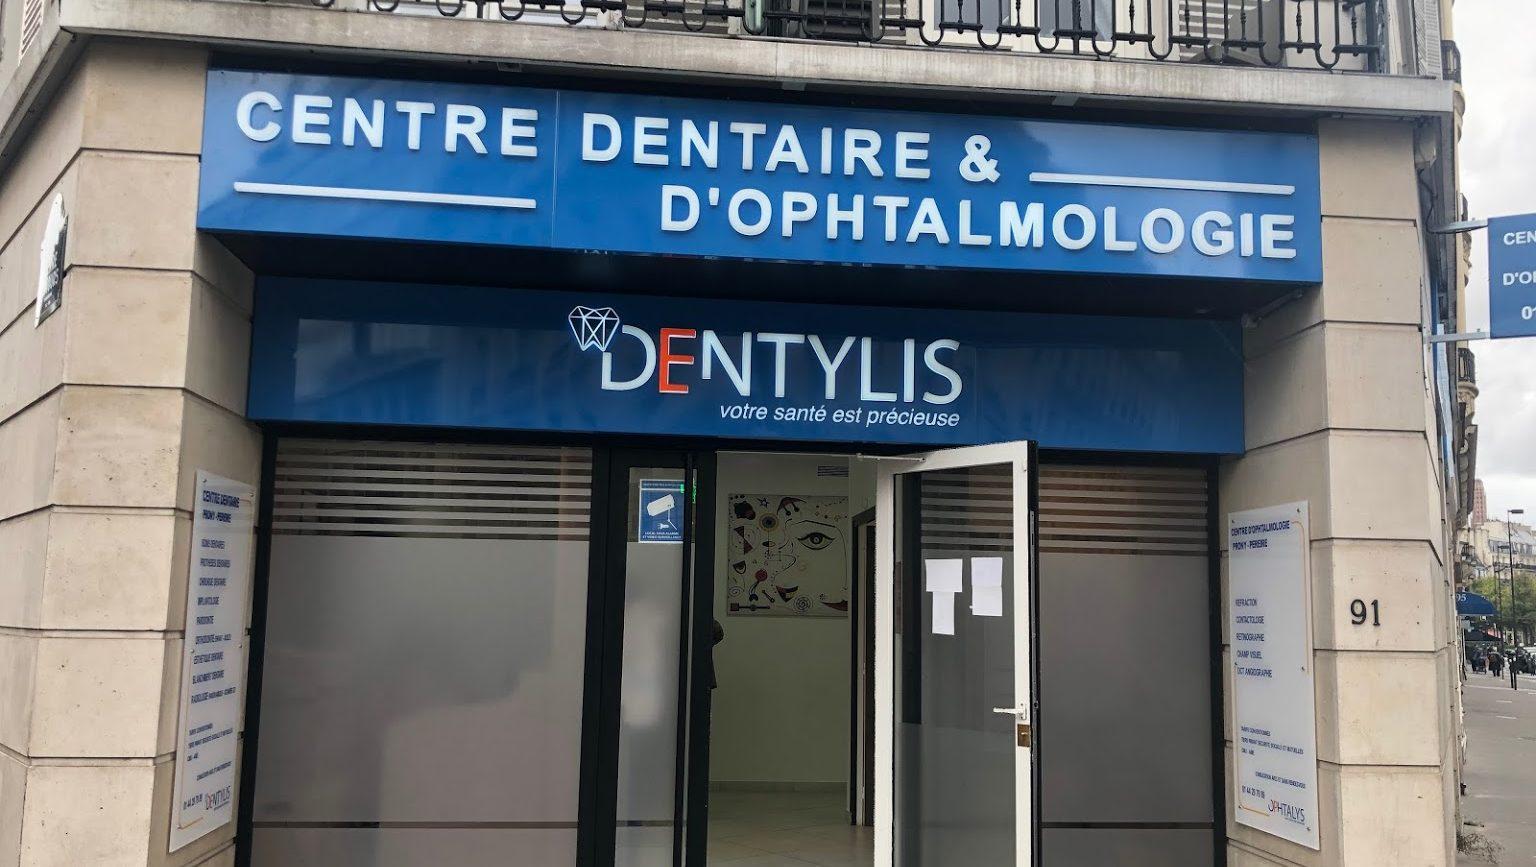 Centre dentaire et ophtalmologie Prony Pereire Dentylis